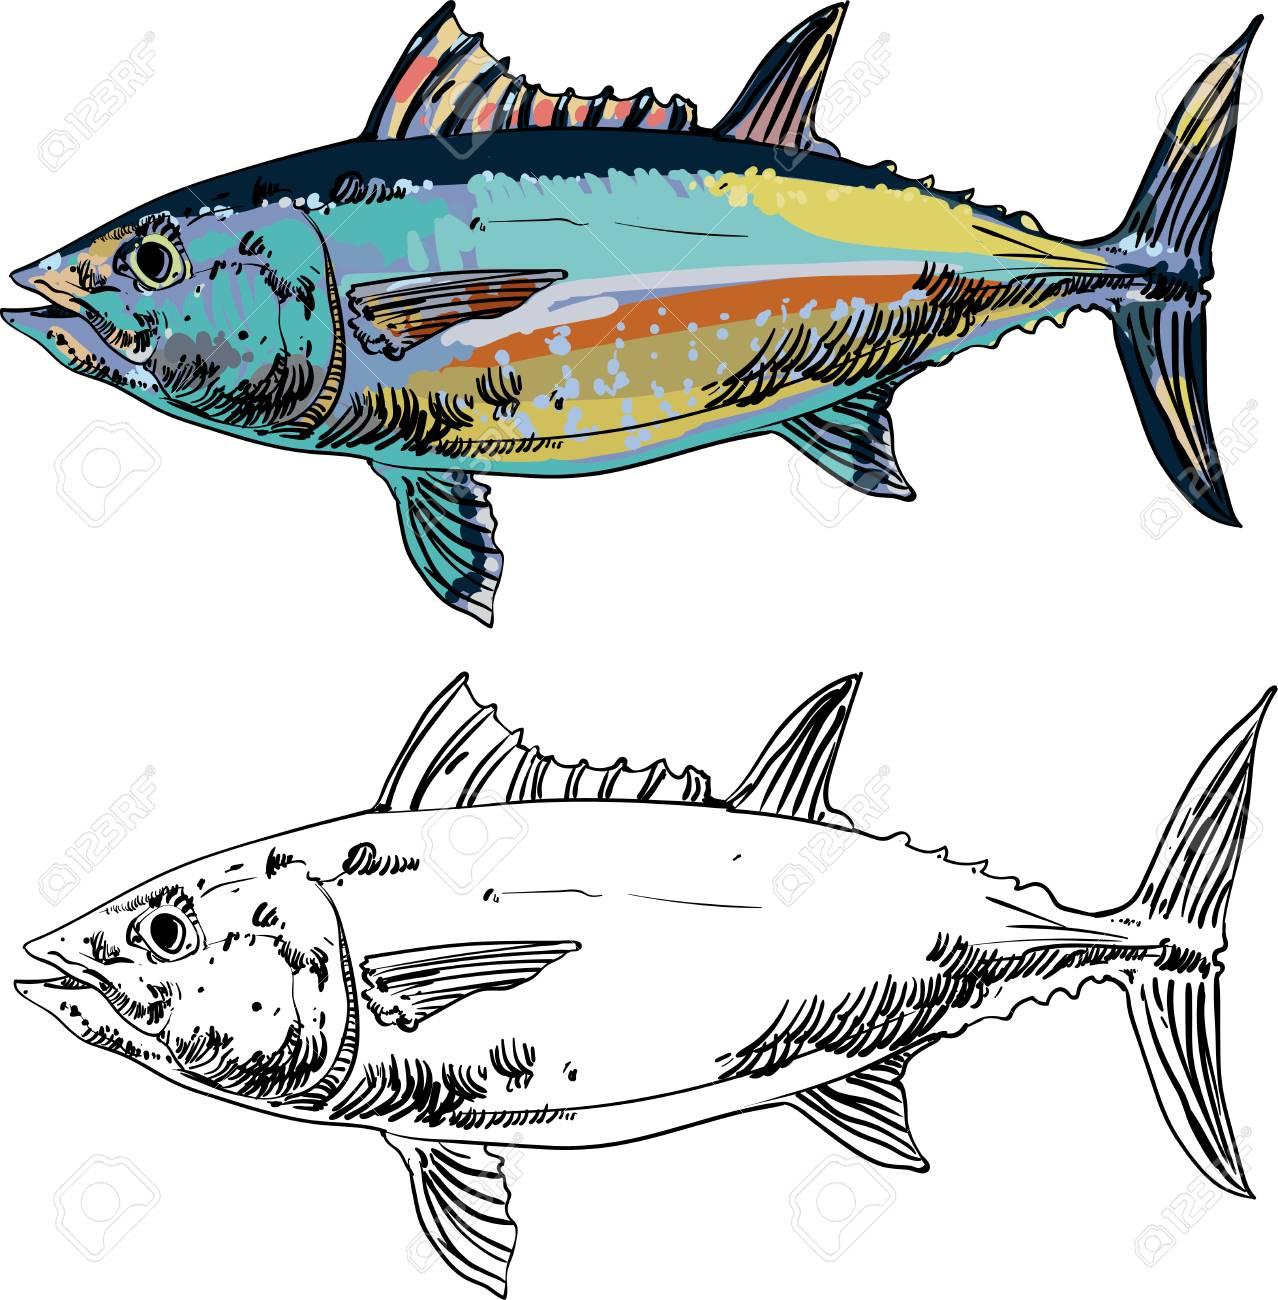 Seafood clipart tuna fish. Free download clip art